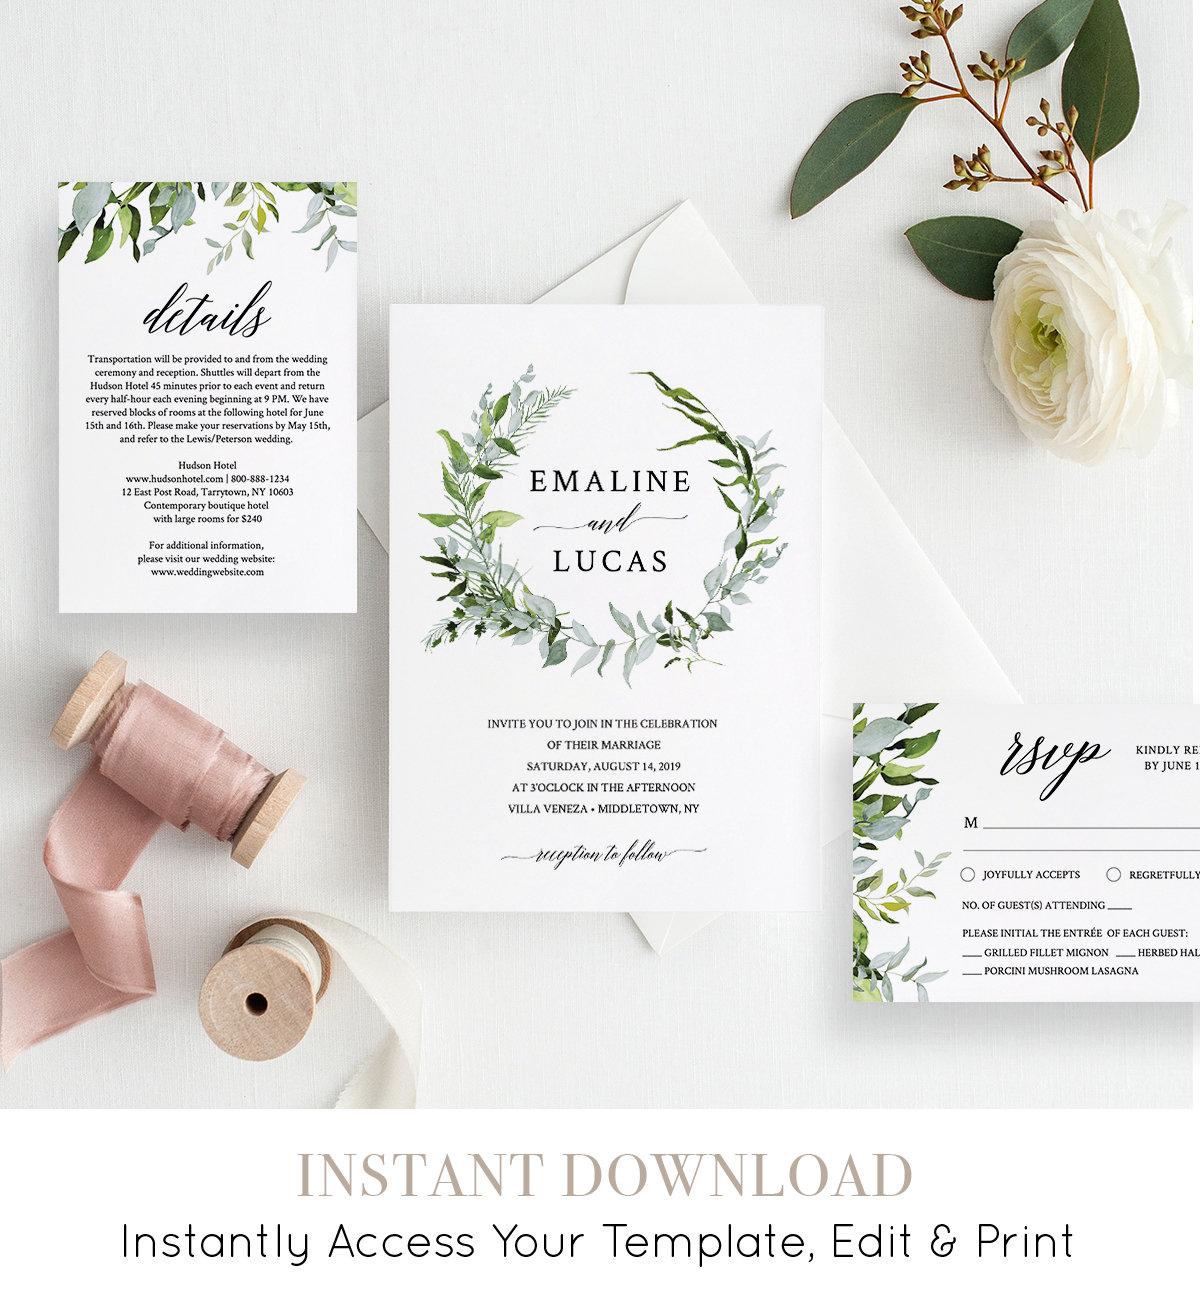 Floral Greenery Wreath Blaire Templett DIY Instant Download Digital Editable PDF Printable Response Card Wedding Invitation RSVP Template